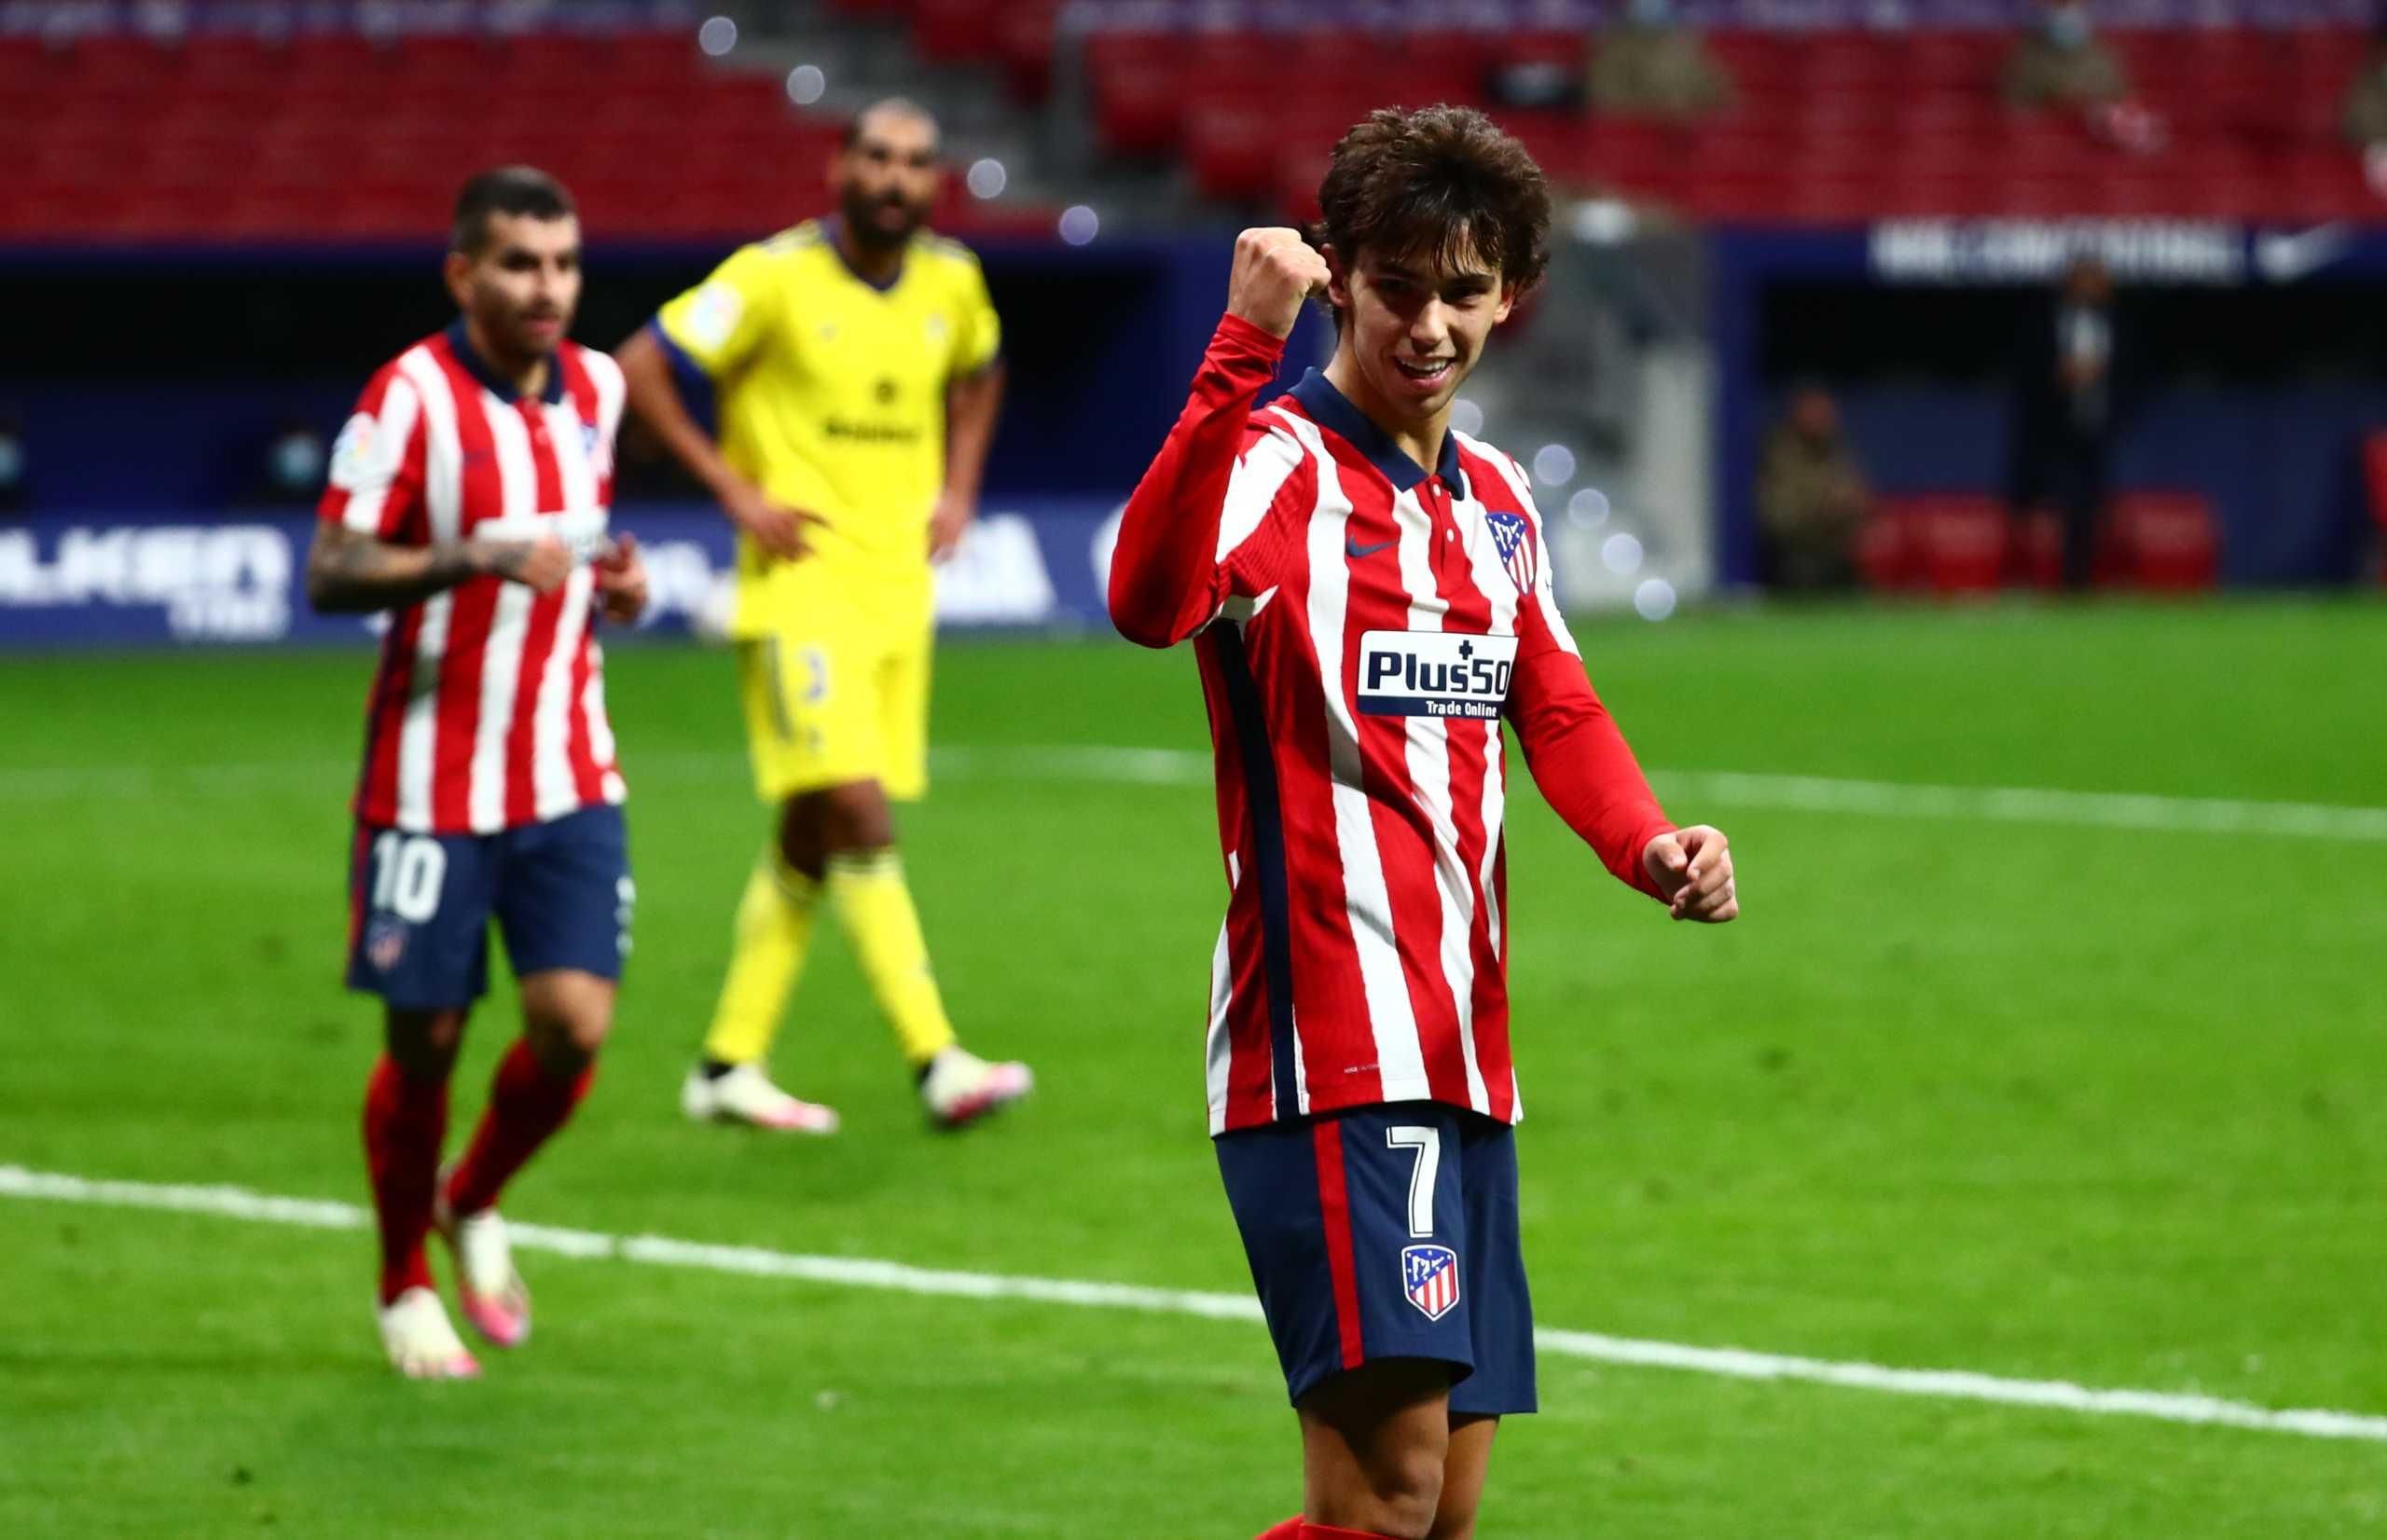 La Liga: Στην κορυφή η Ατλέτικο Μαδρίτης με σούπερ Φέλιξ (video)